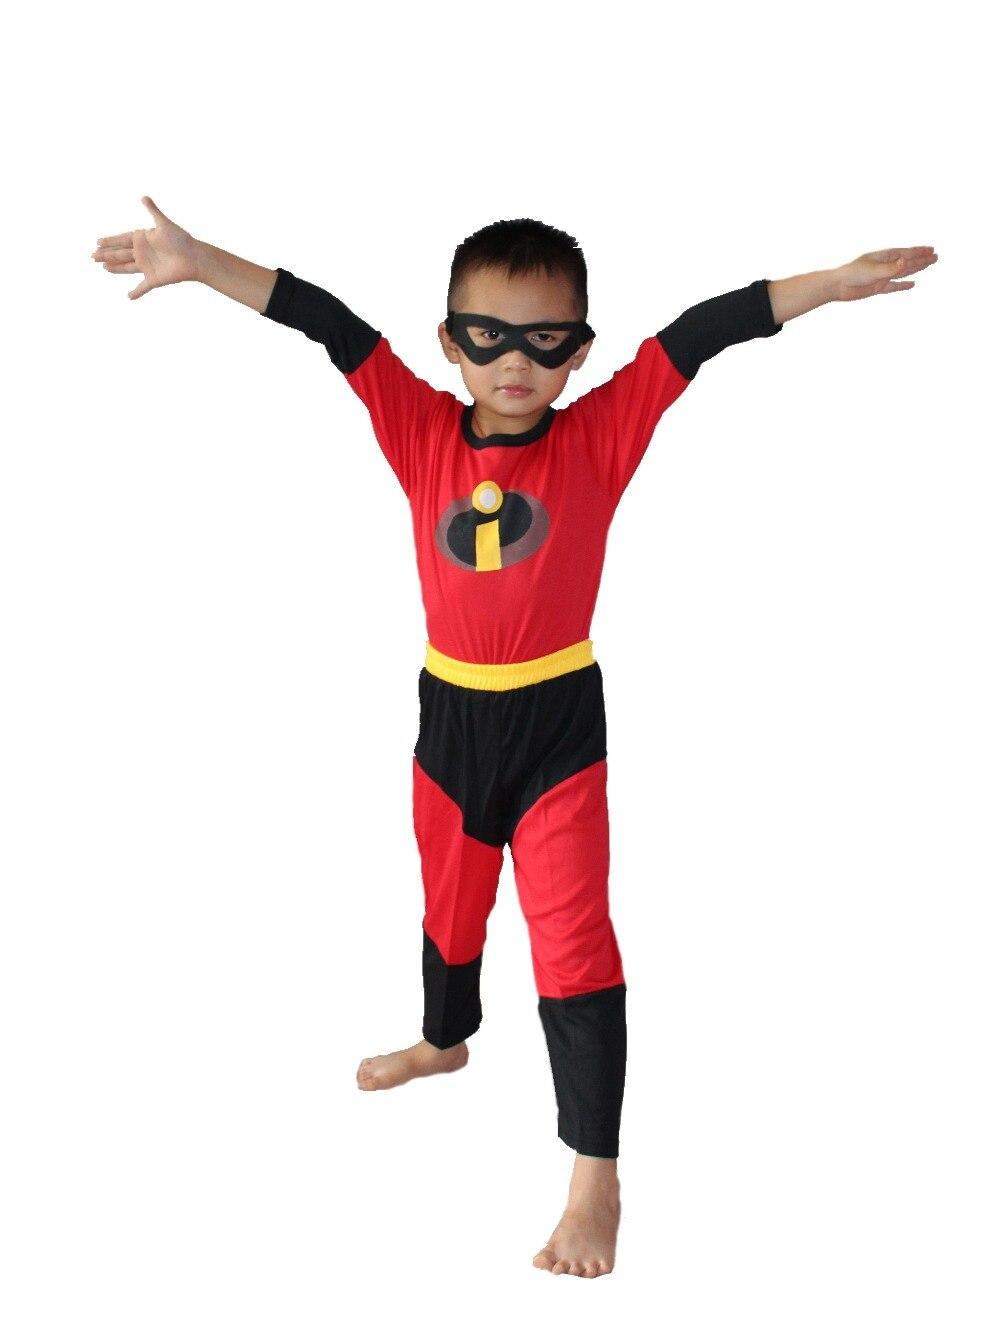 Retail fiesta de Halloween trajes increíbles de rol les indestructibles Cosplay ropa, niños Ghost: S-XXL